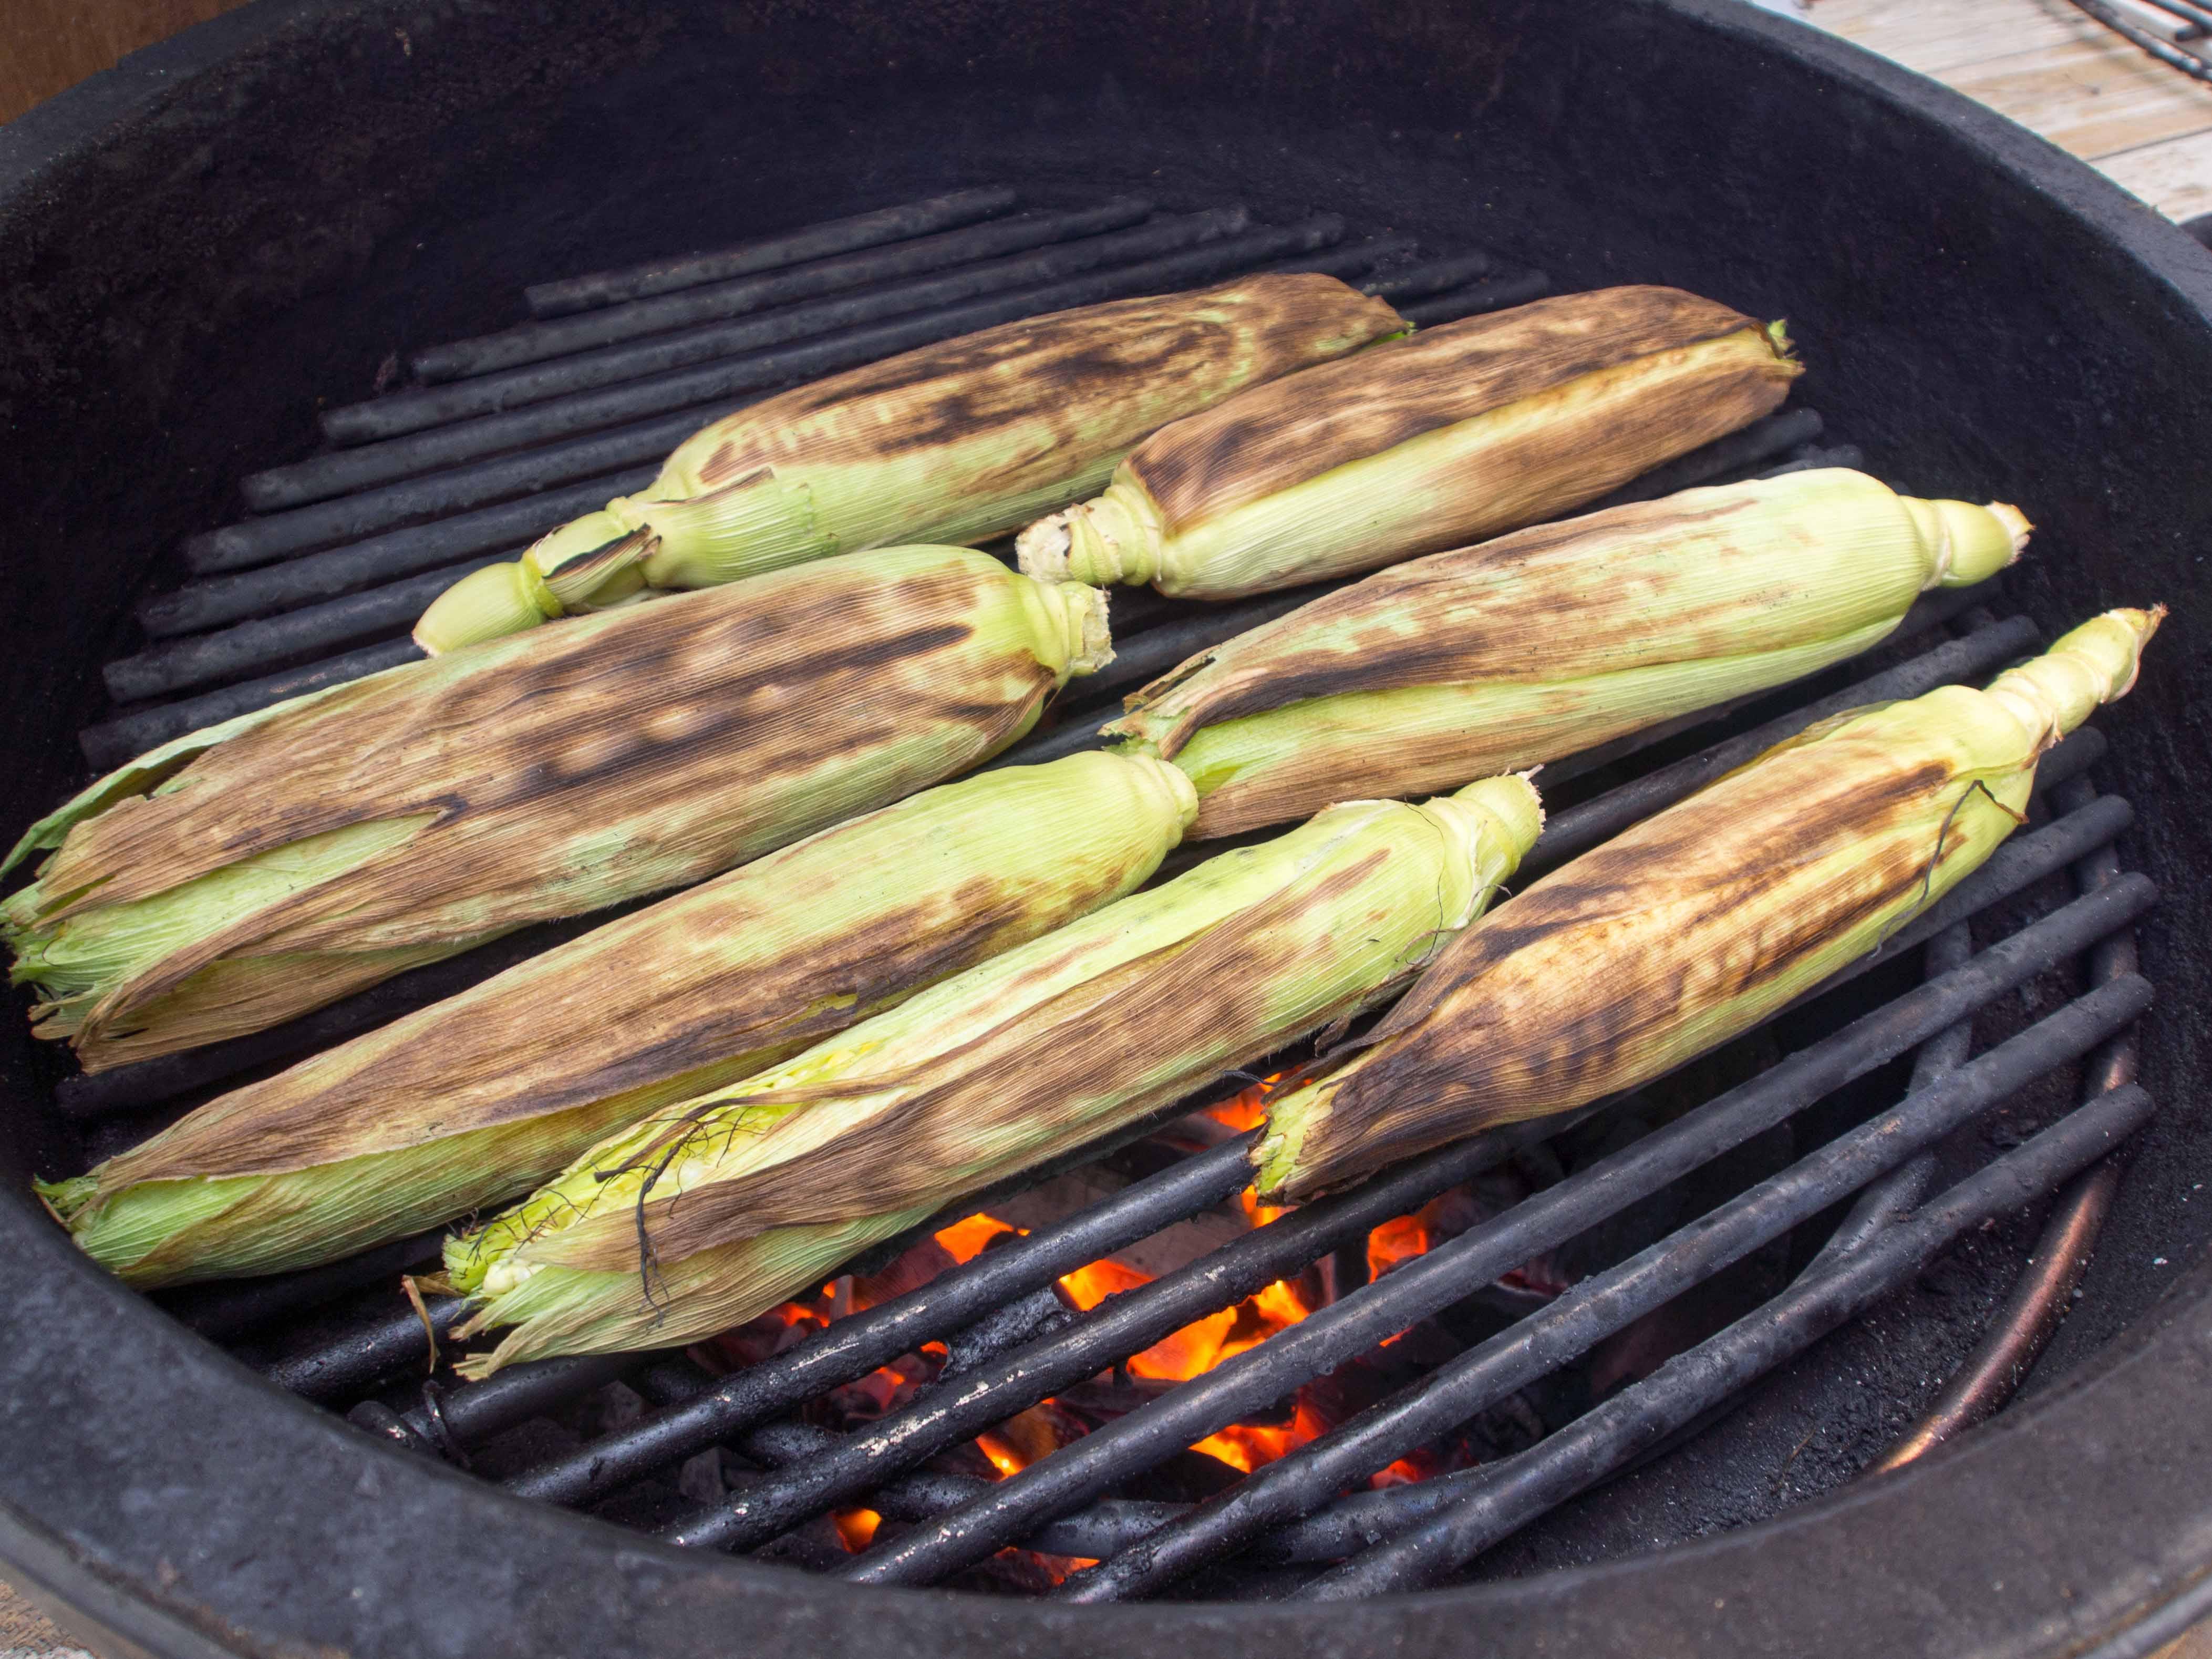 Grill Corn In Husk  Grilled Sweet Corn in the Husk Food & Fire